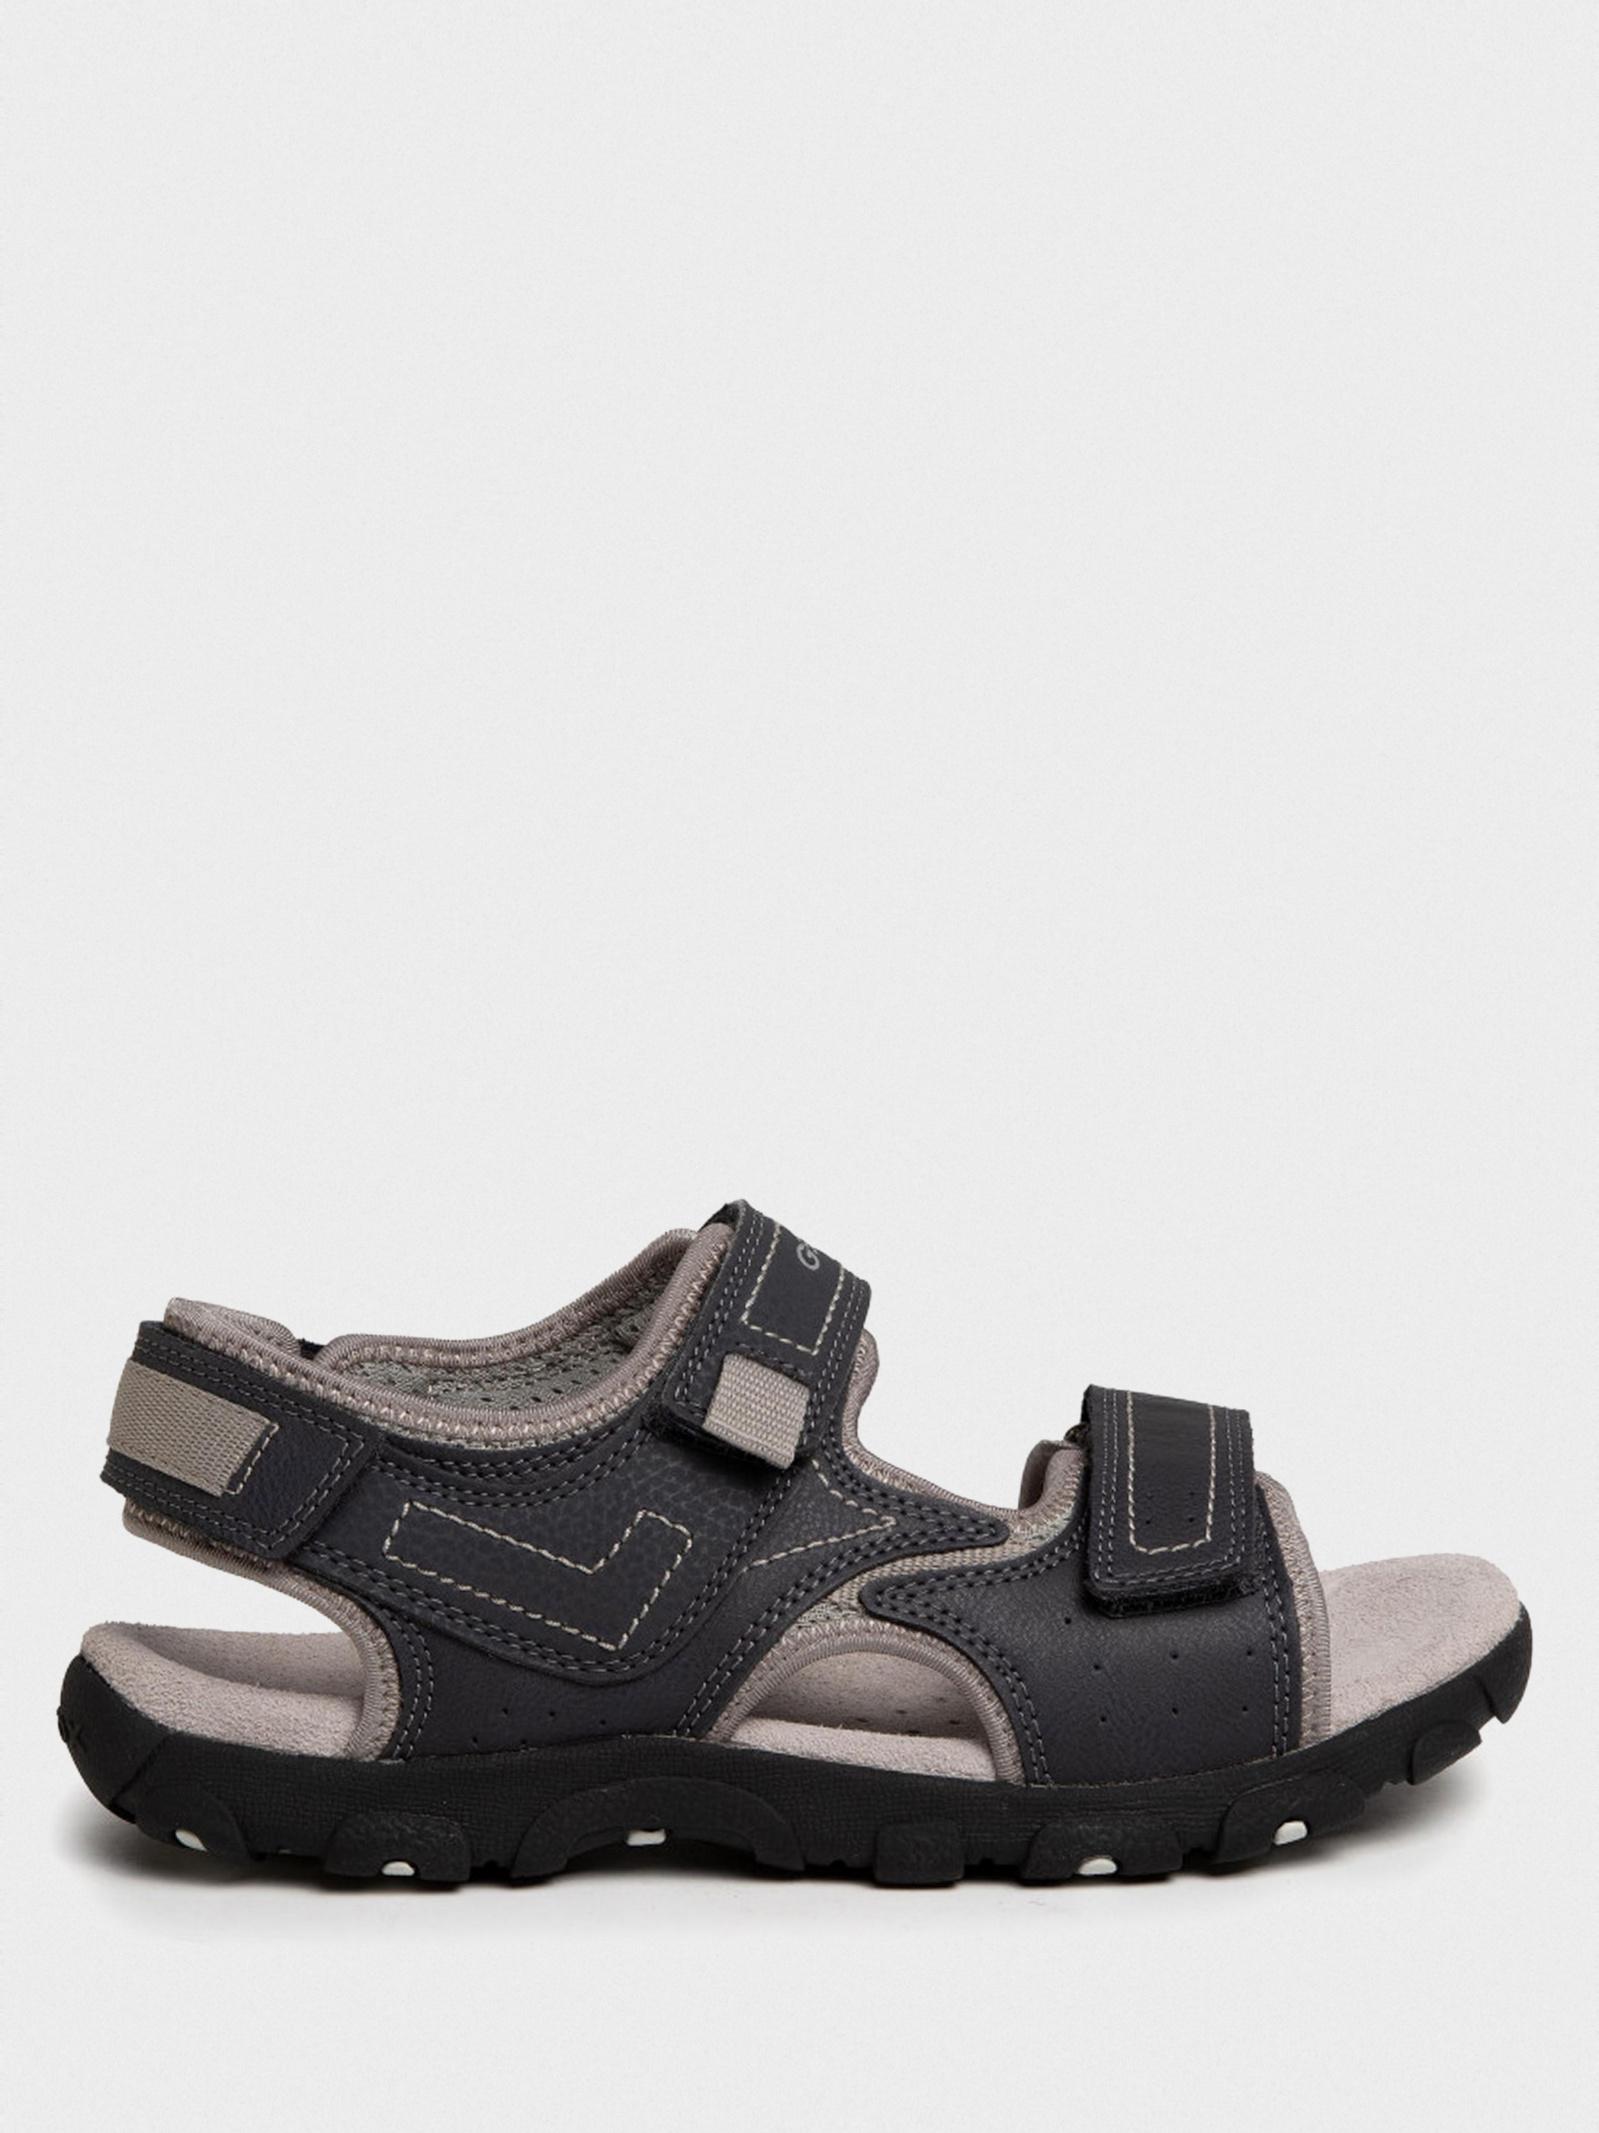 Сандалии для детей Geox JR SANDAL STRADA J0224A-0MECE-C0661 размерная сетка обуви, 2017